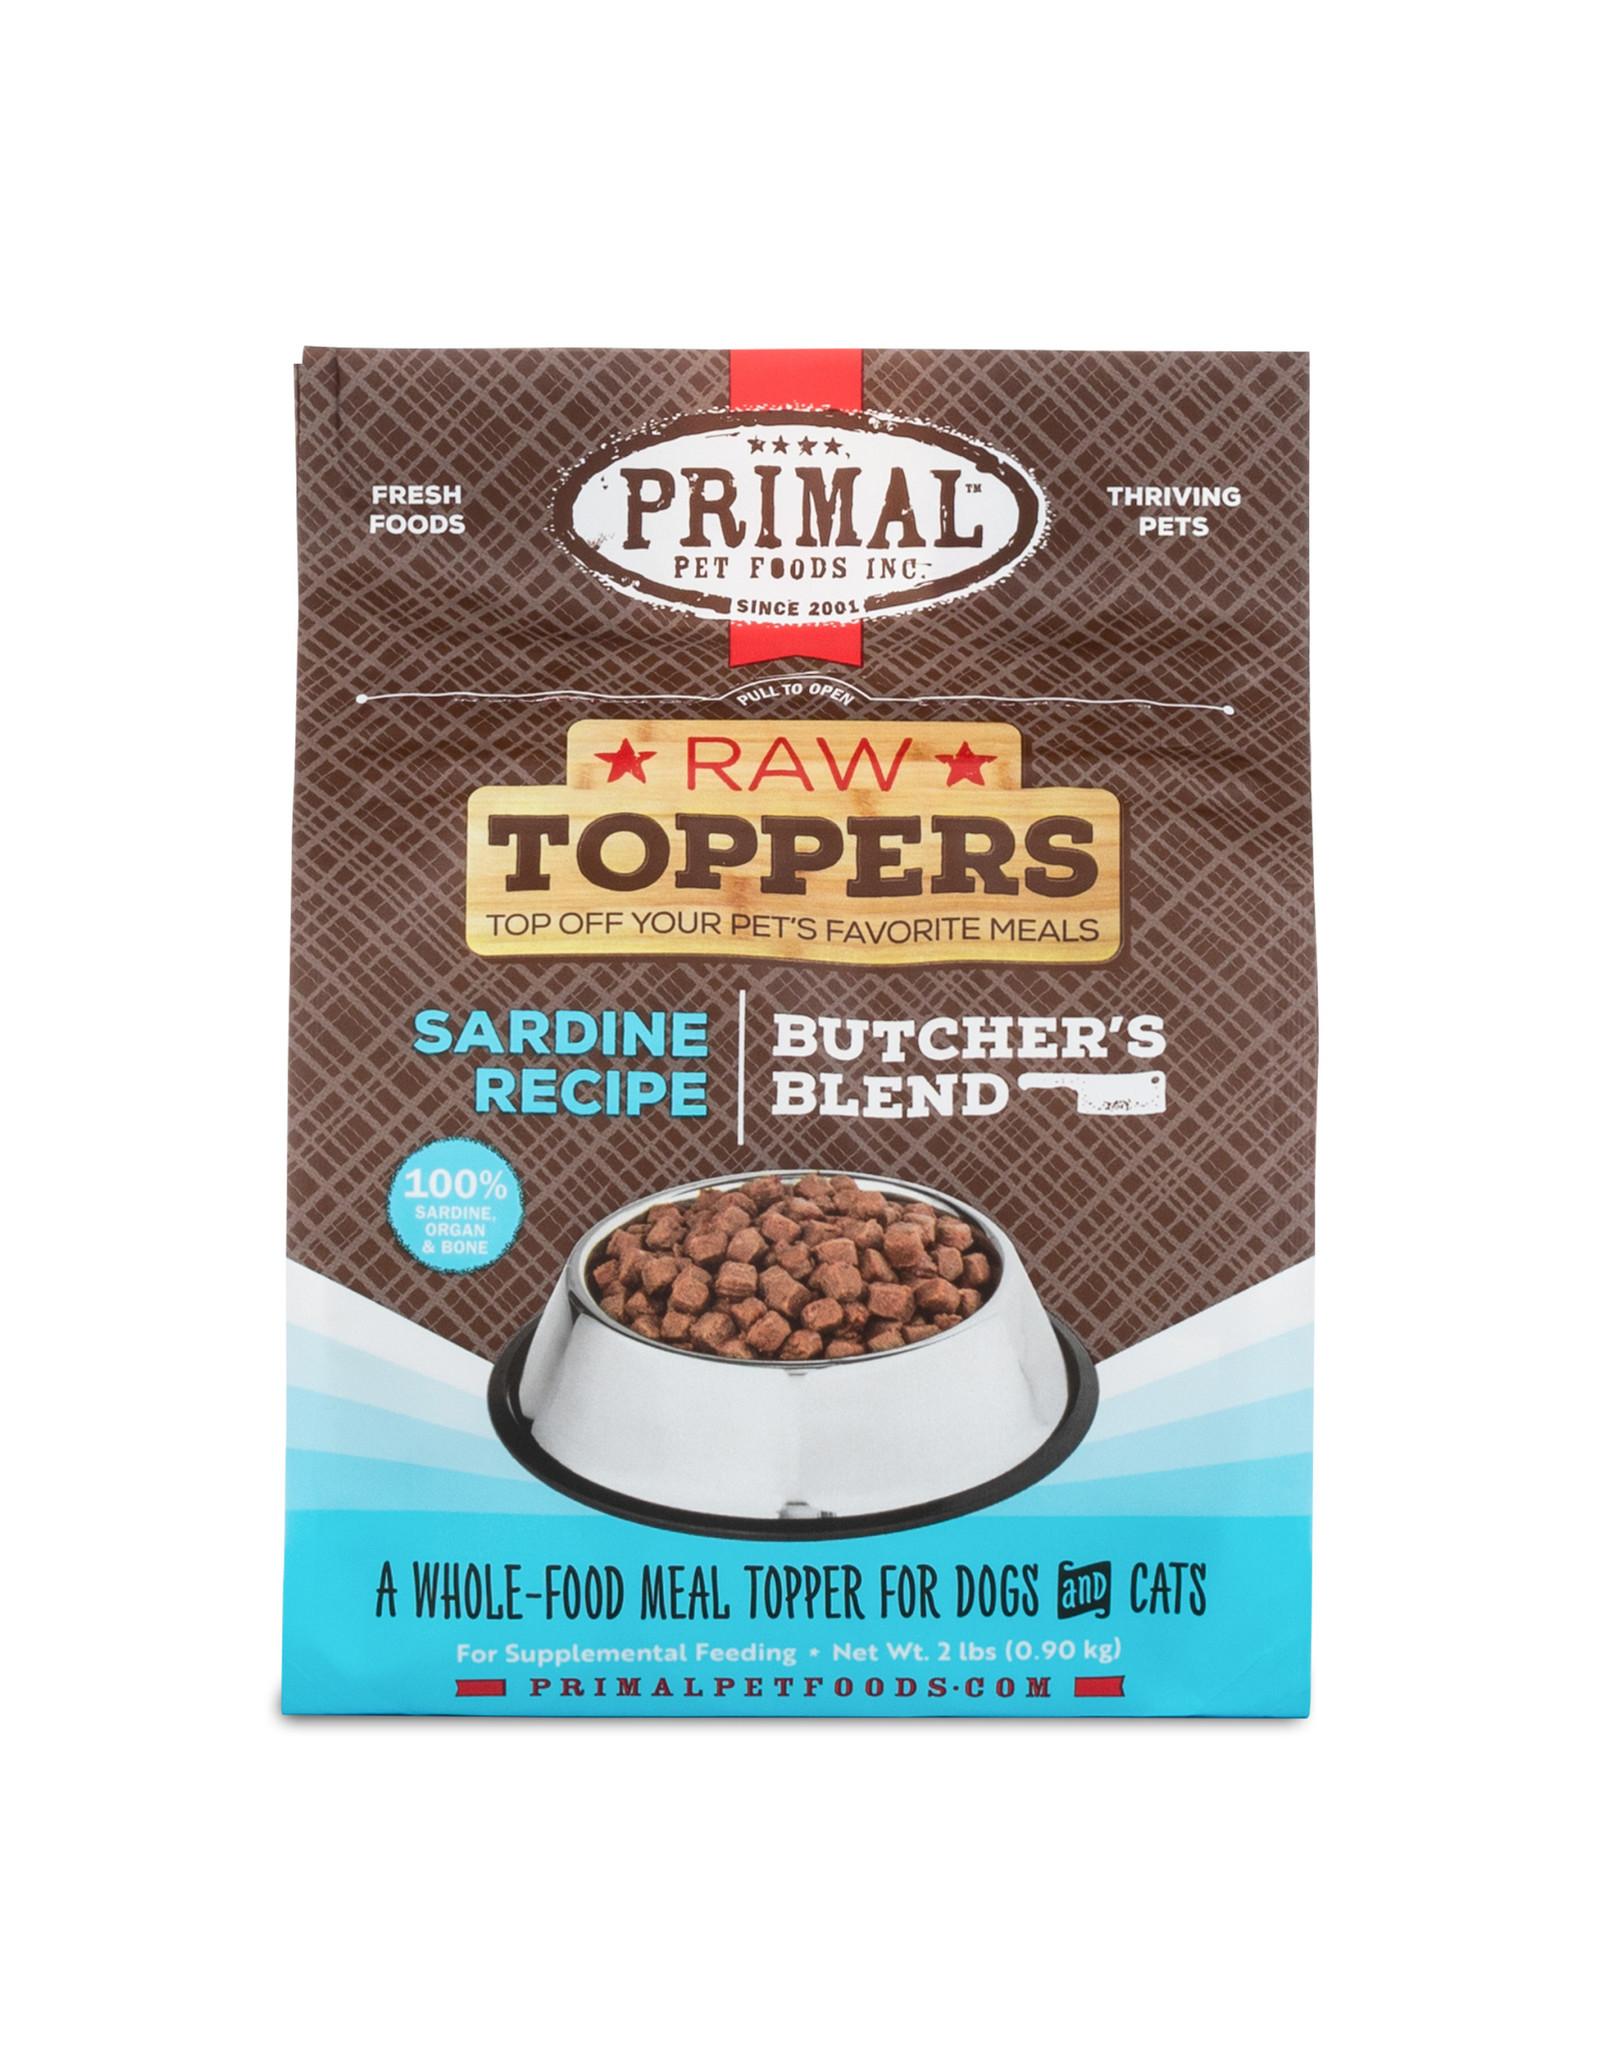 Primal Pet Foods Primal Raw Toppers Butcher's Blend Sardine